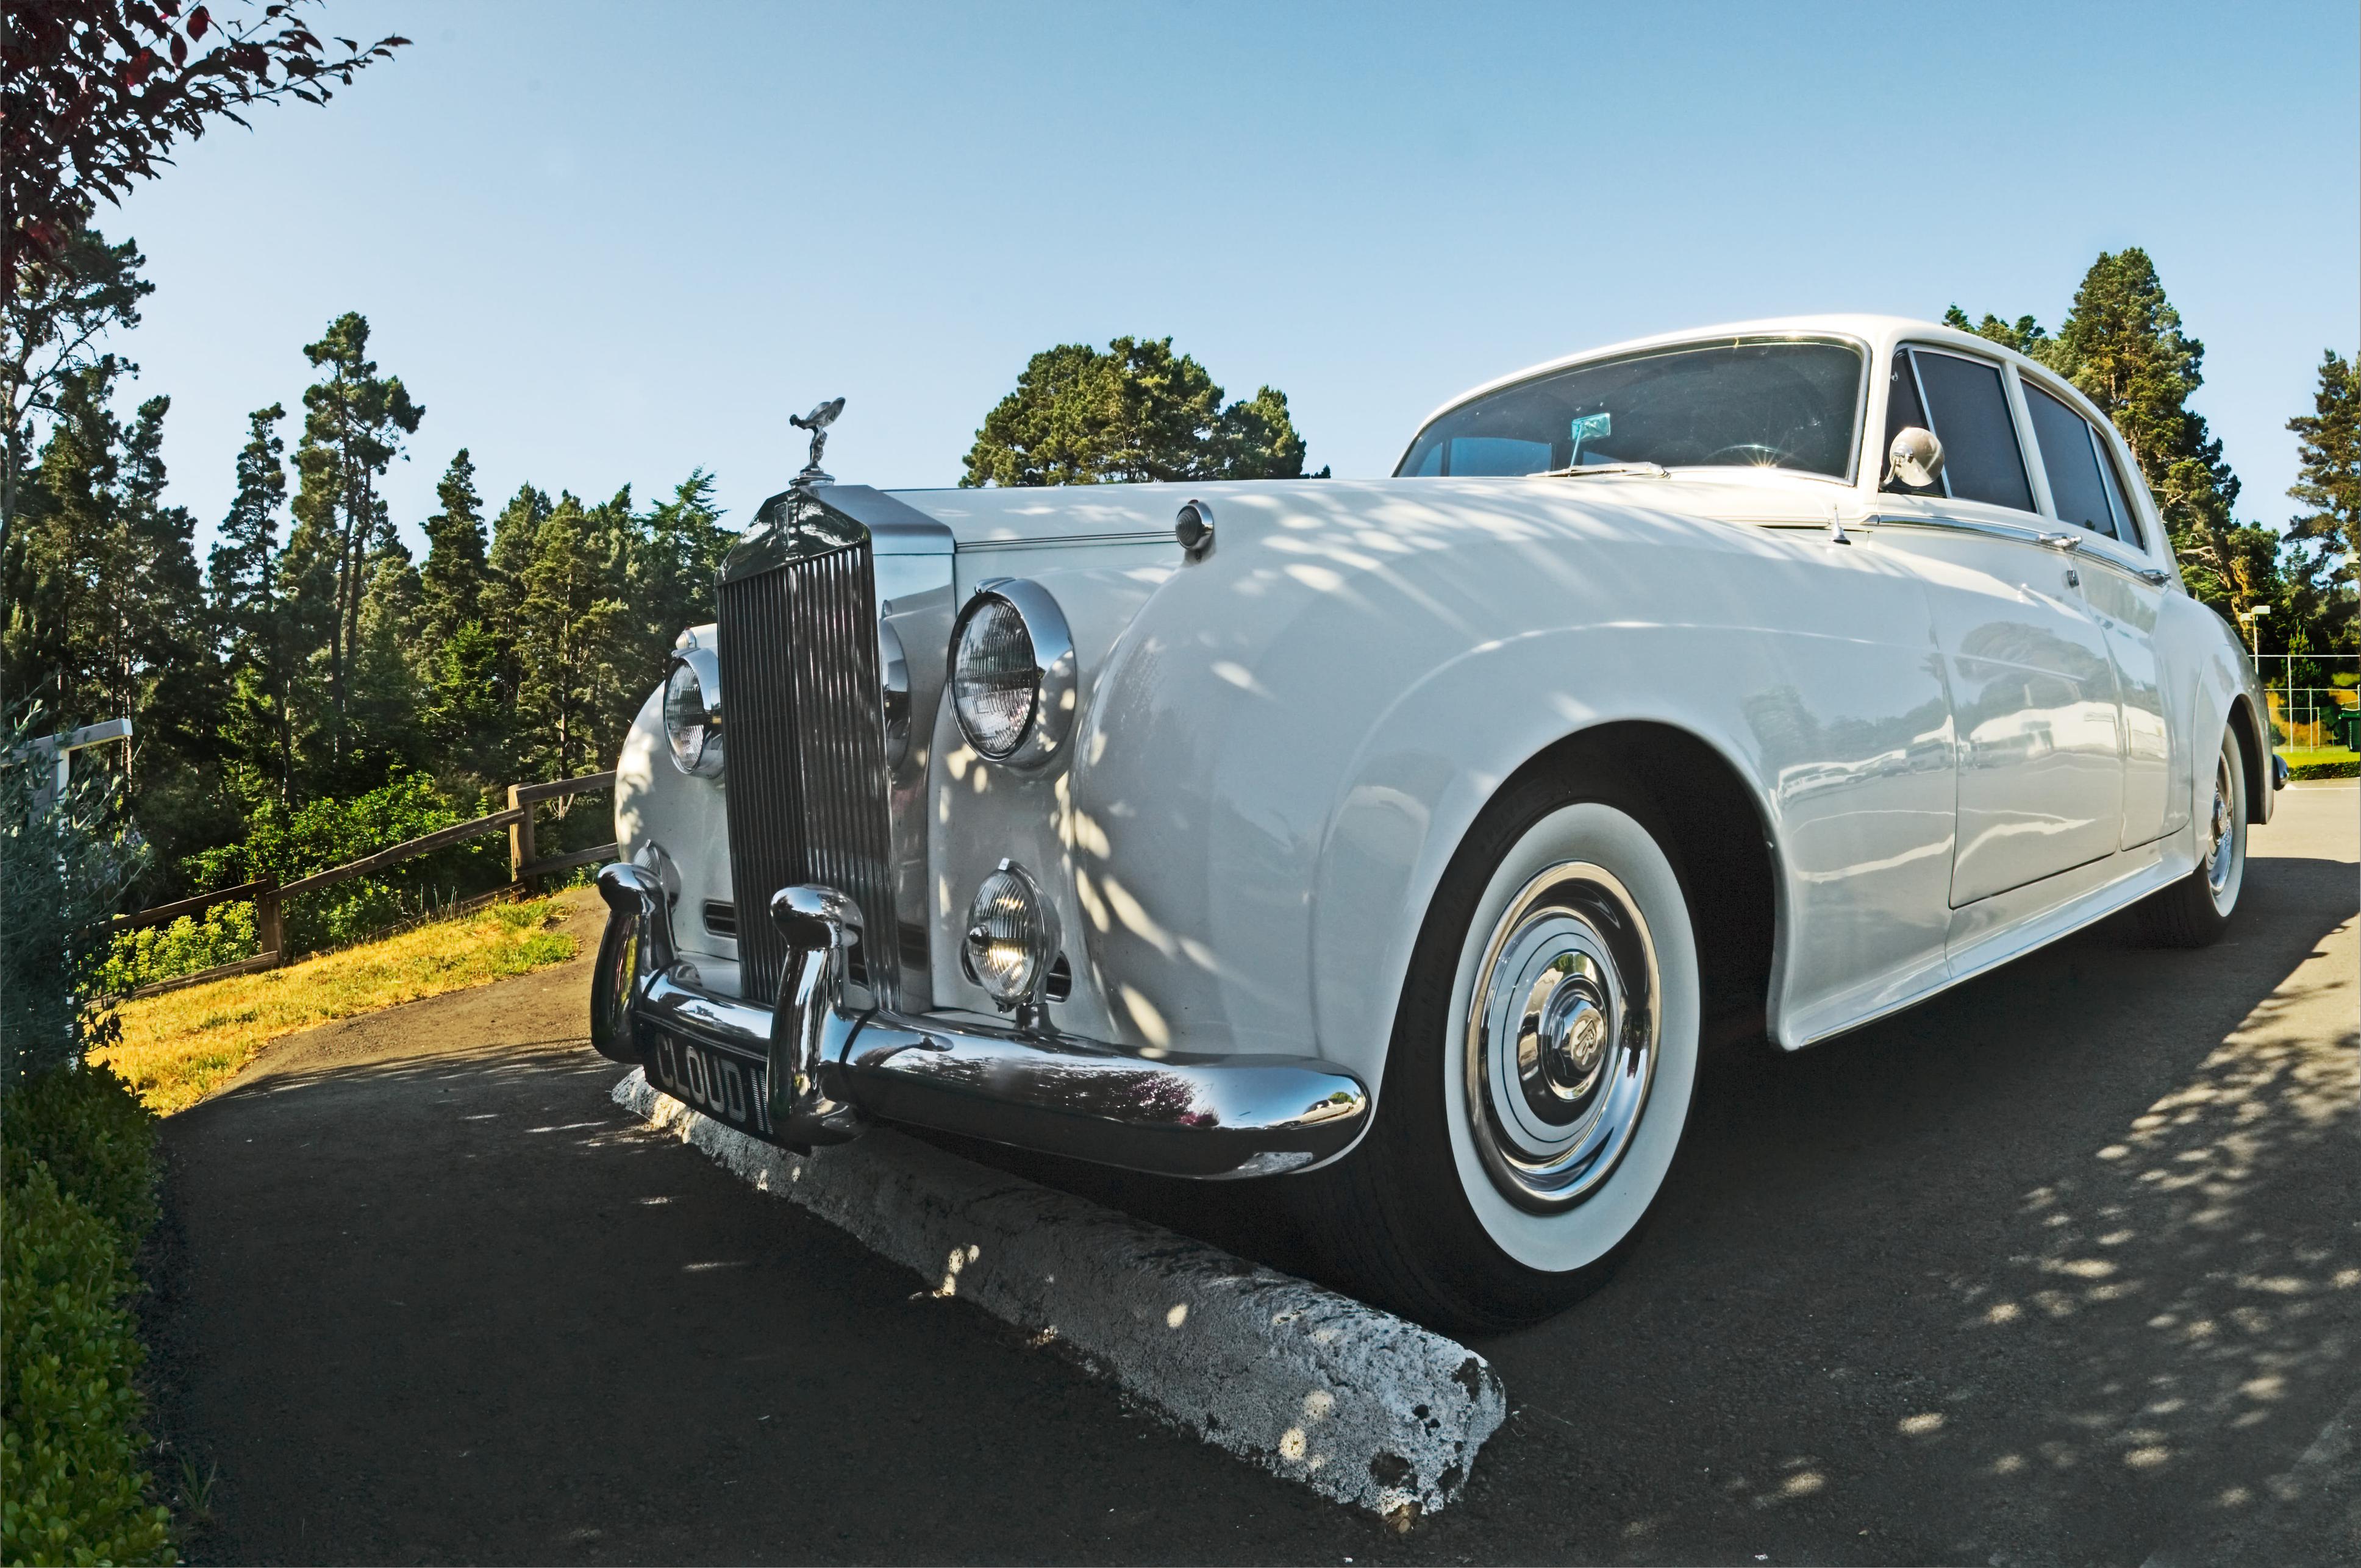 A classic Rolls Royce.